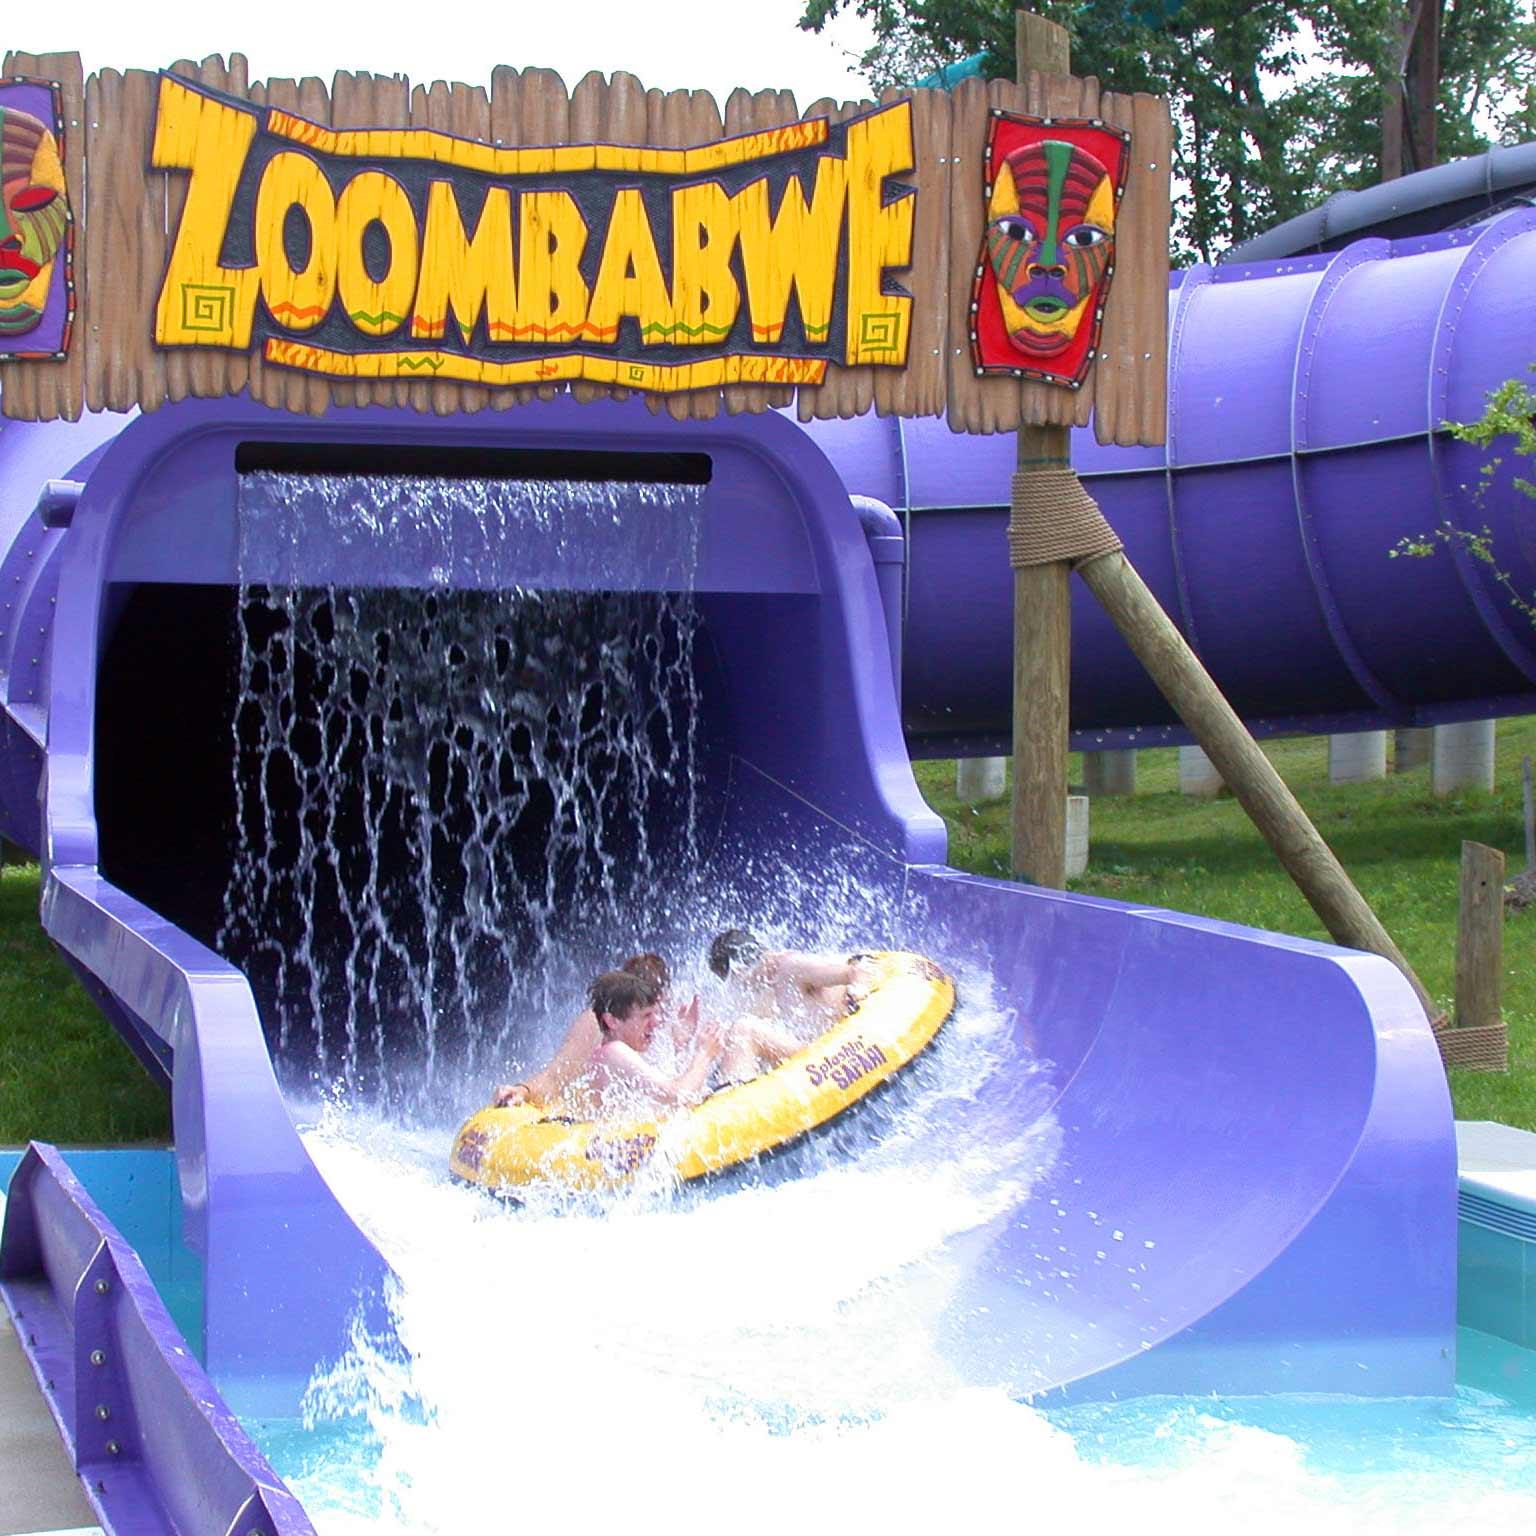 ZOOMbabwe | Holiday World & Splashin' Safari